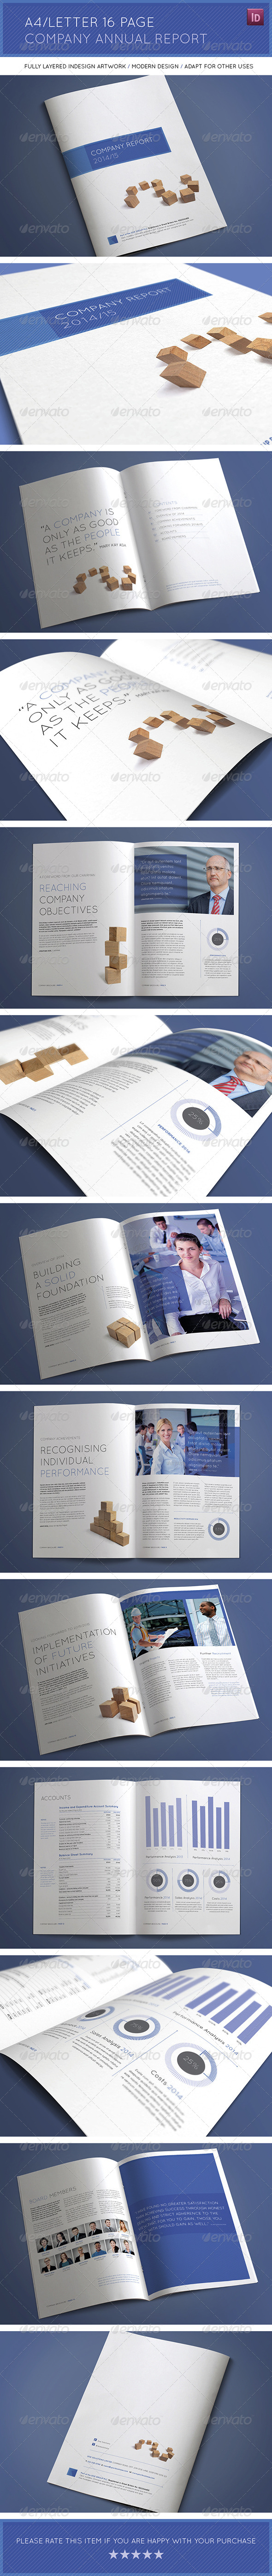 GraphicRiver A4 Letter 16 Page Company Annual Report 8040442